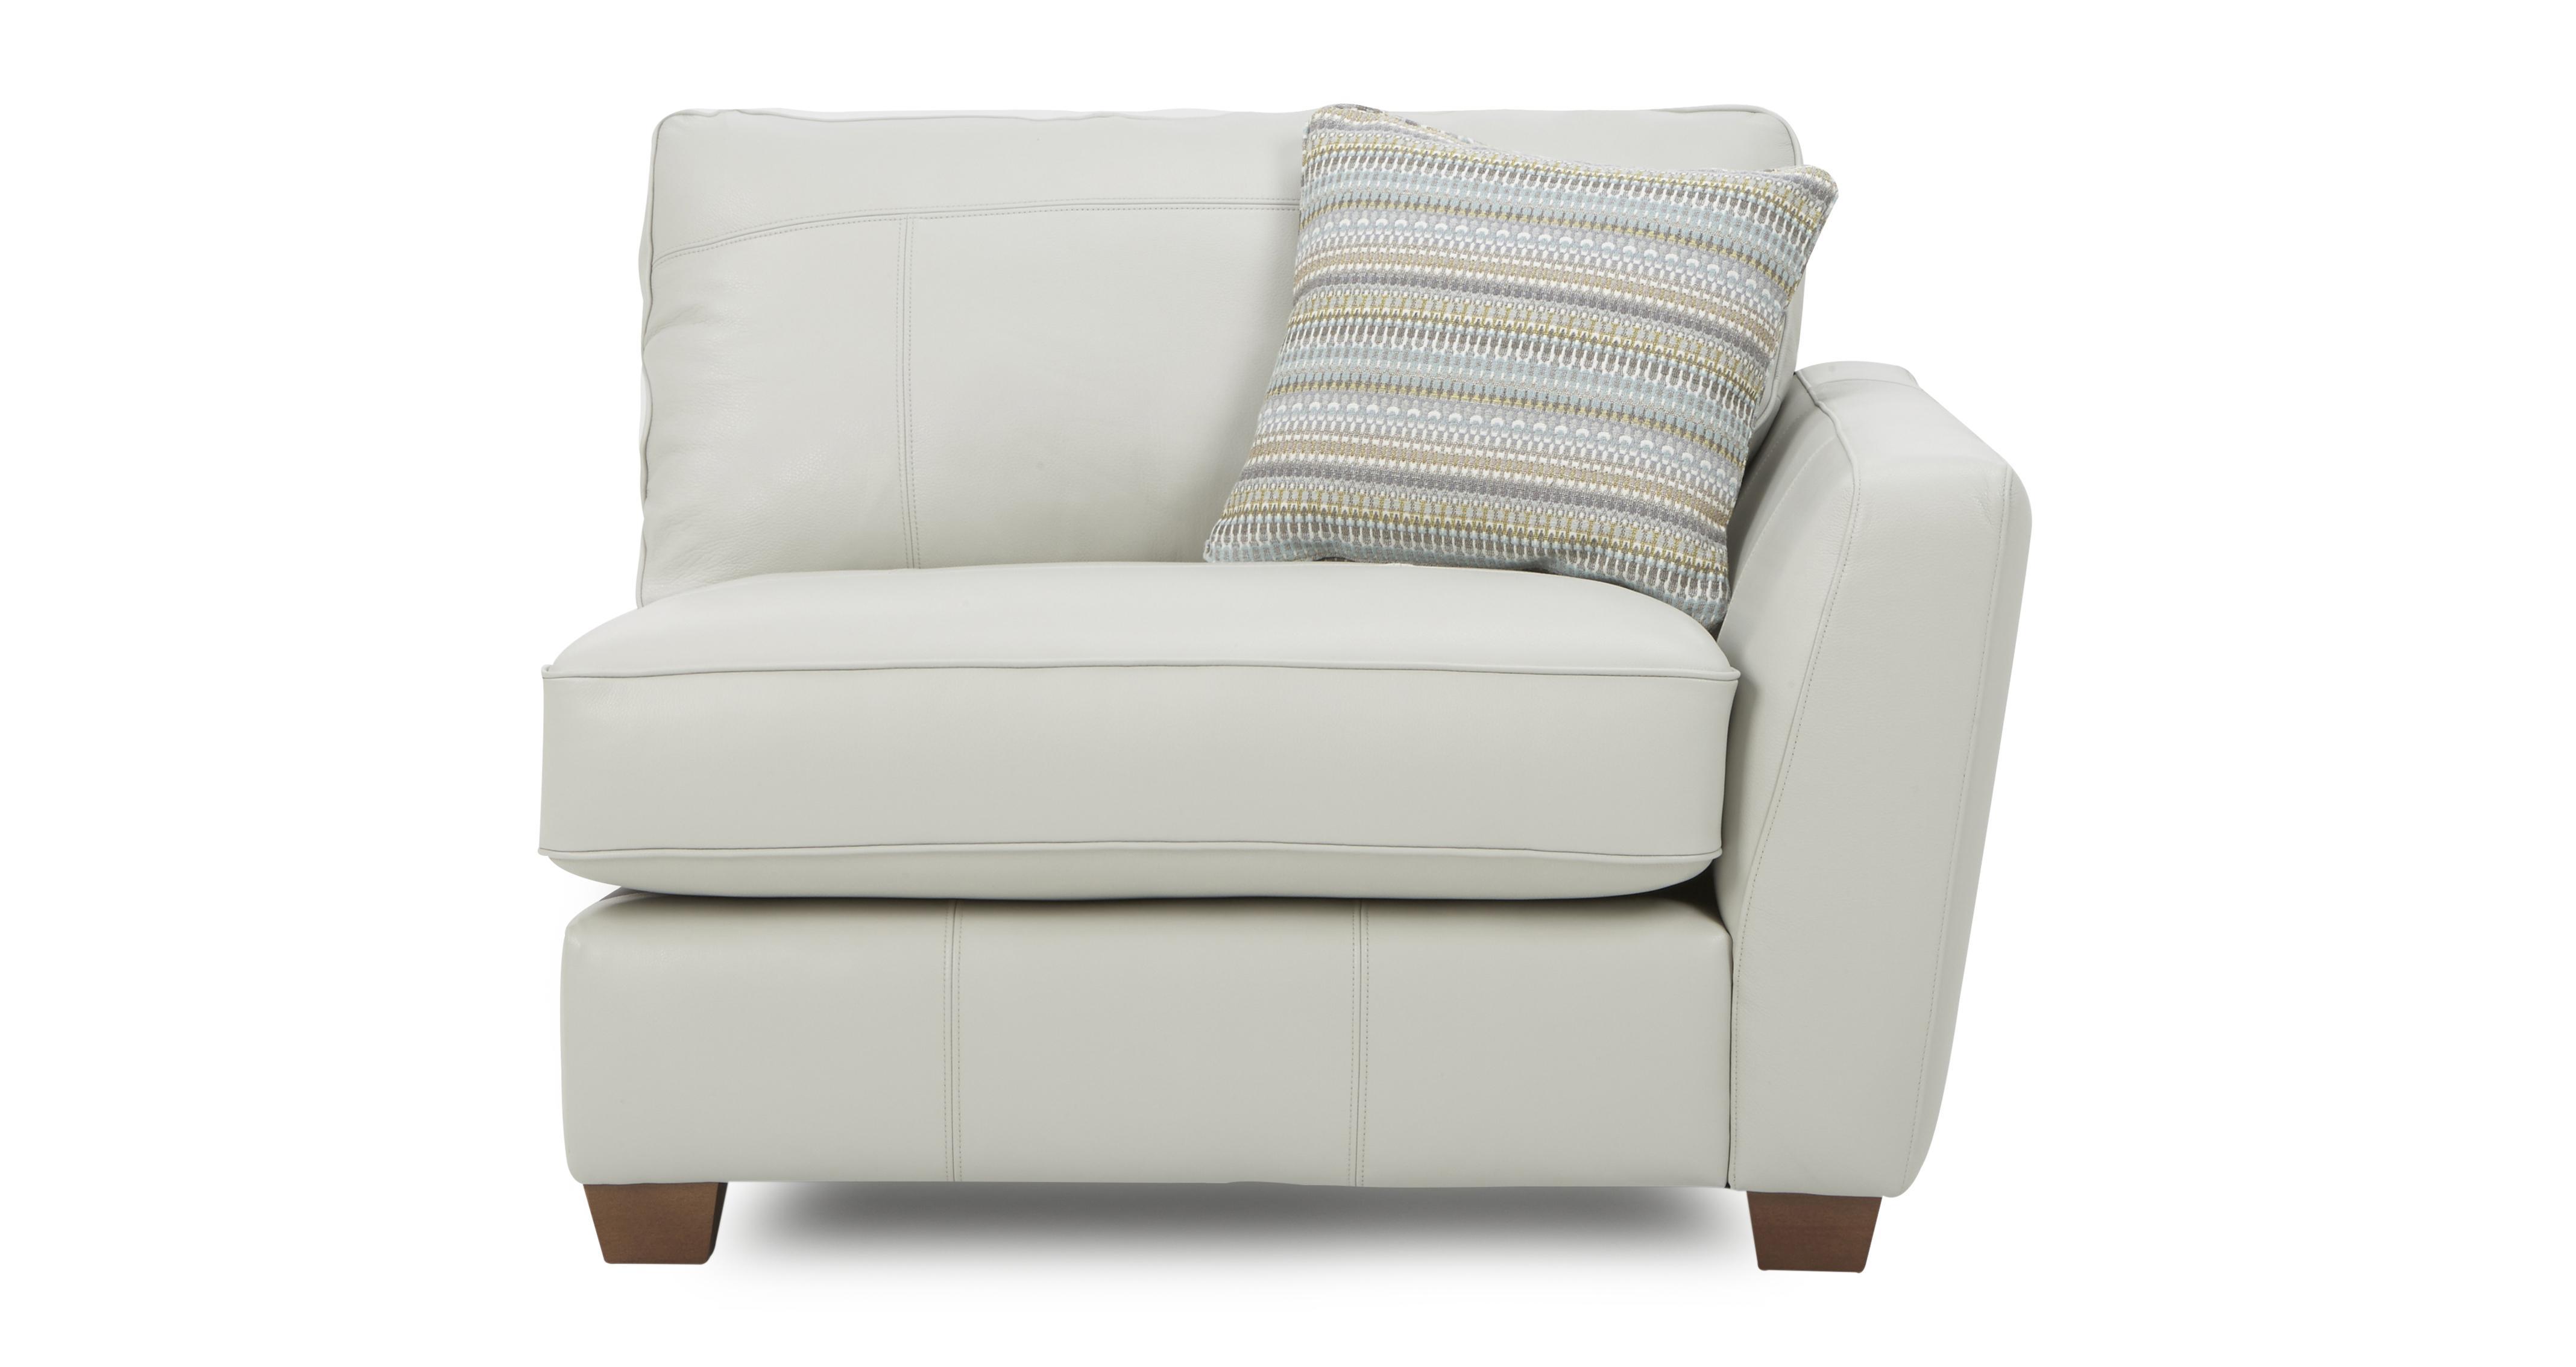 dfs sophia sofa reviews power recline leather right arm facing cuddler unit